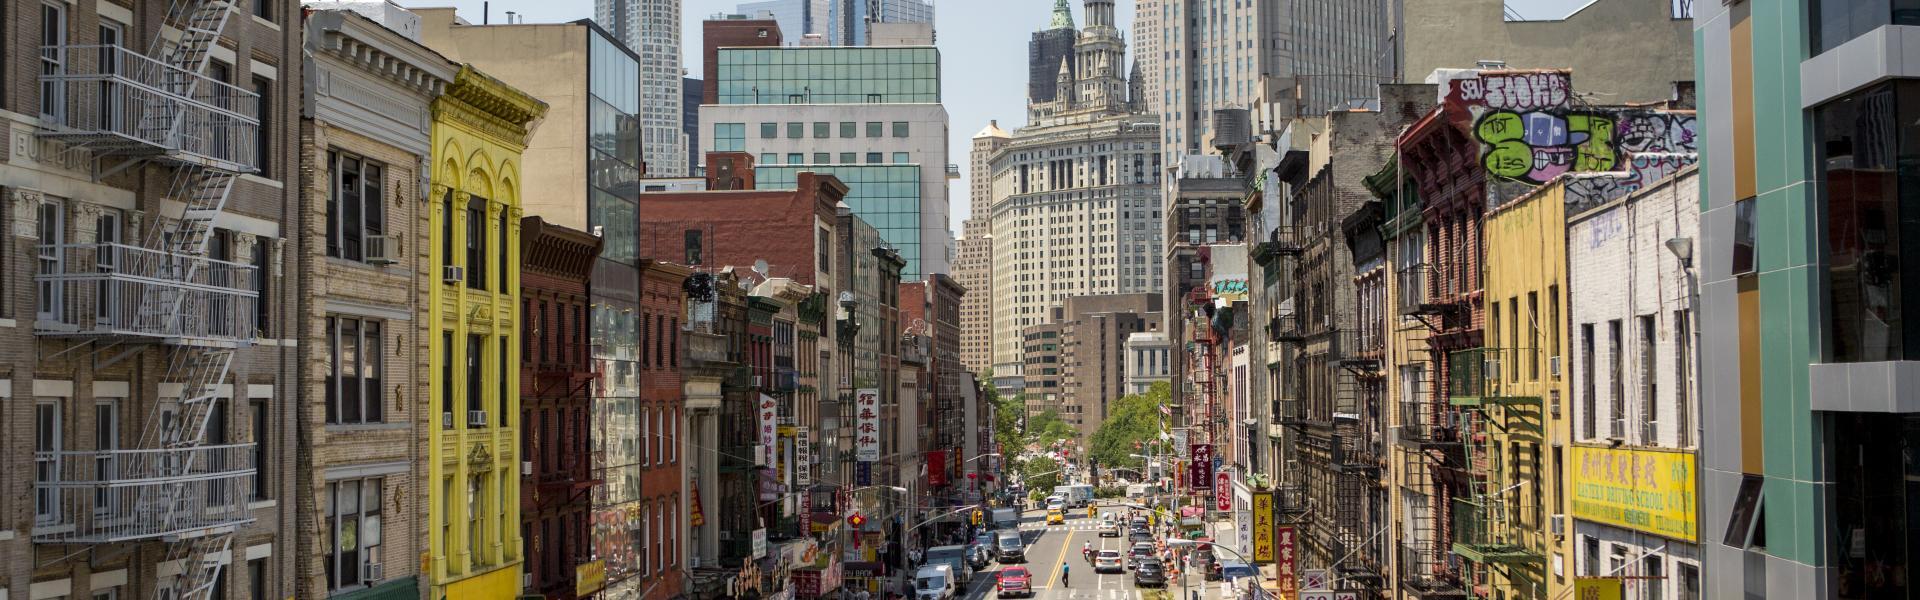 ManhattanBridge_LowerManhattan_NYC_BrittanyPetronella